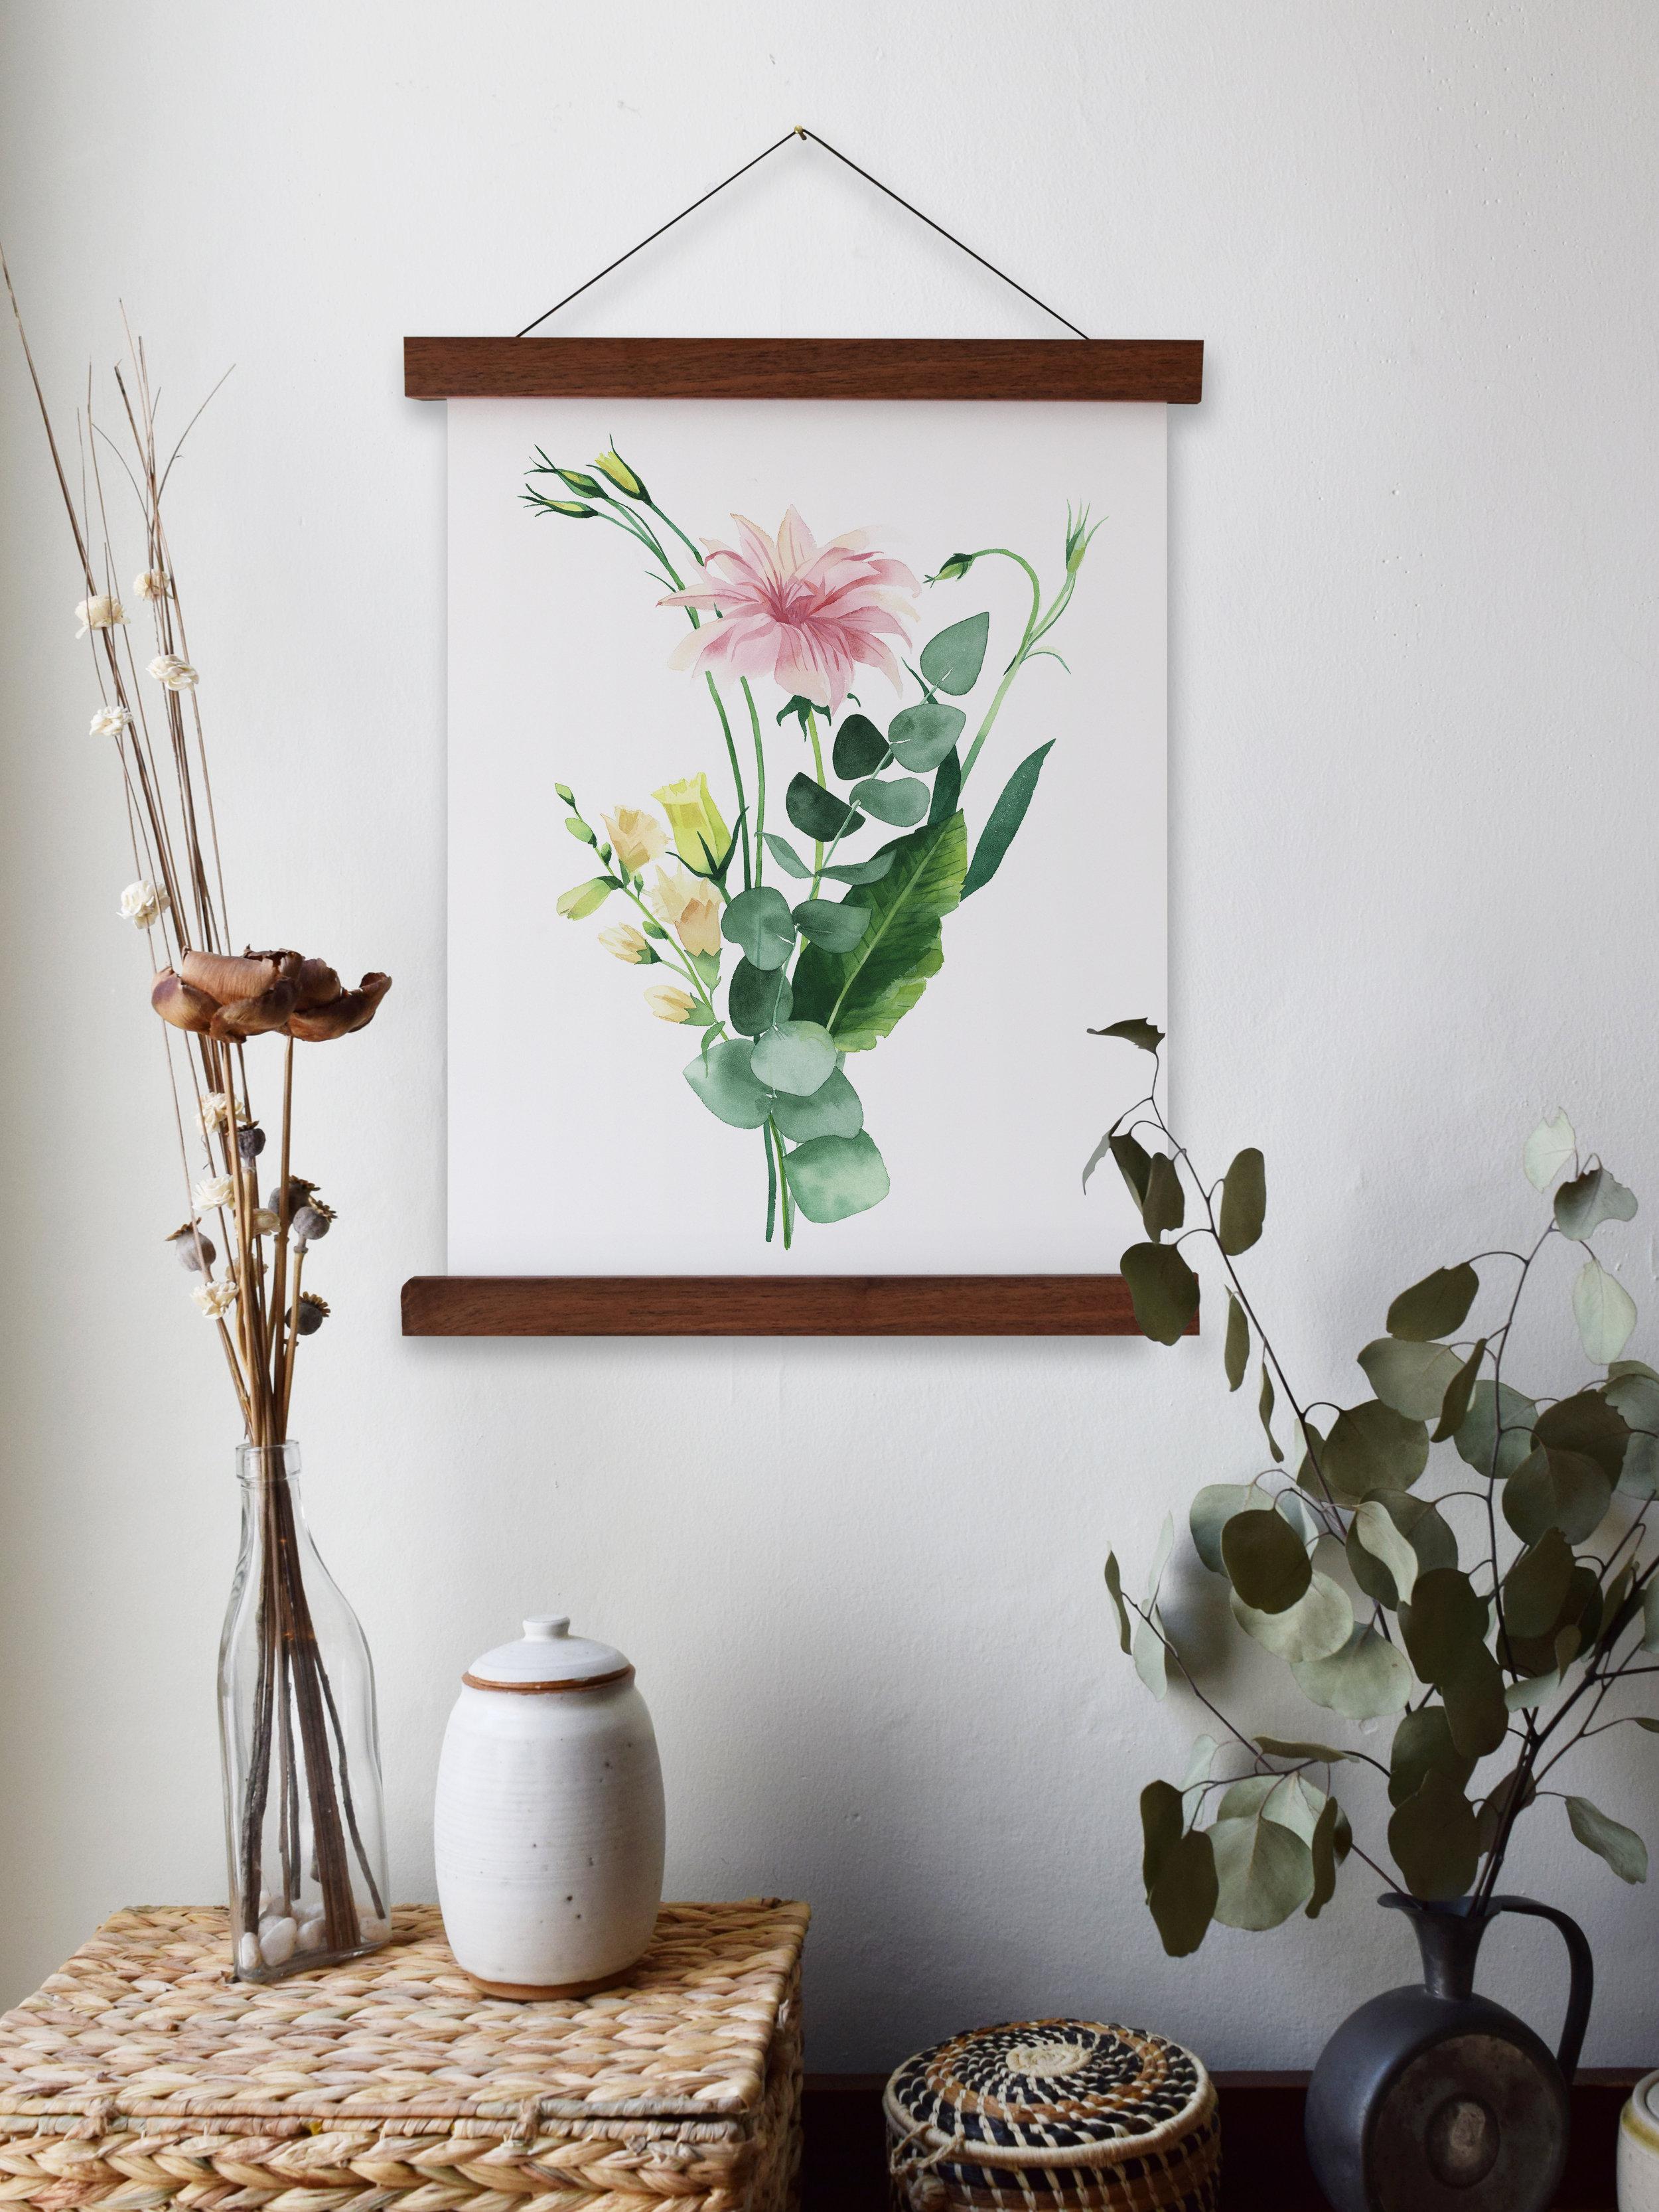 Framed watercolor eucalyptus artwork